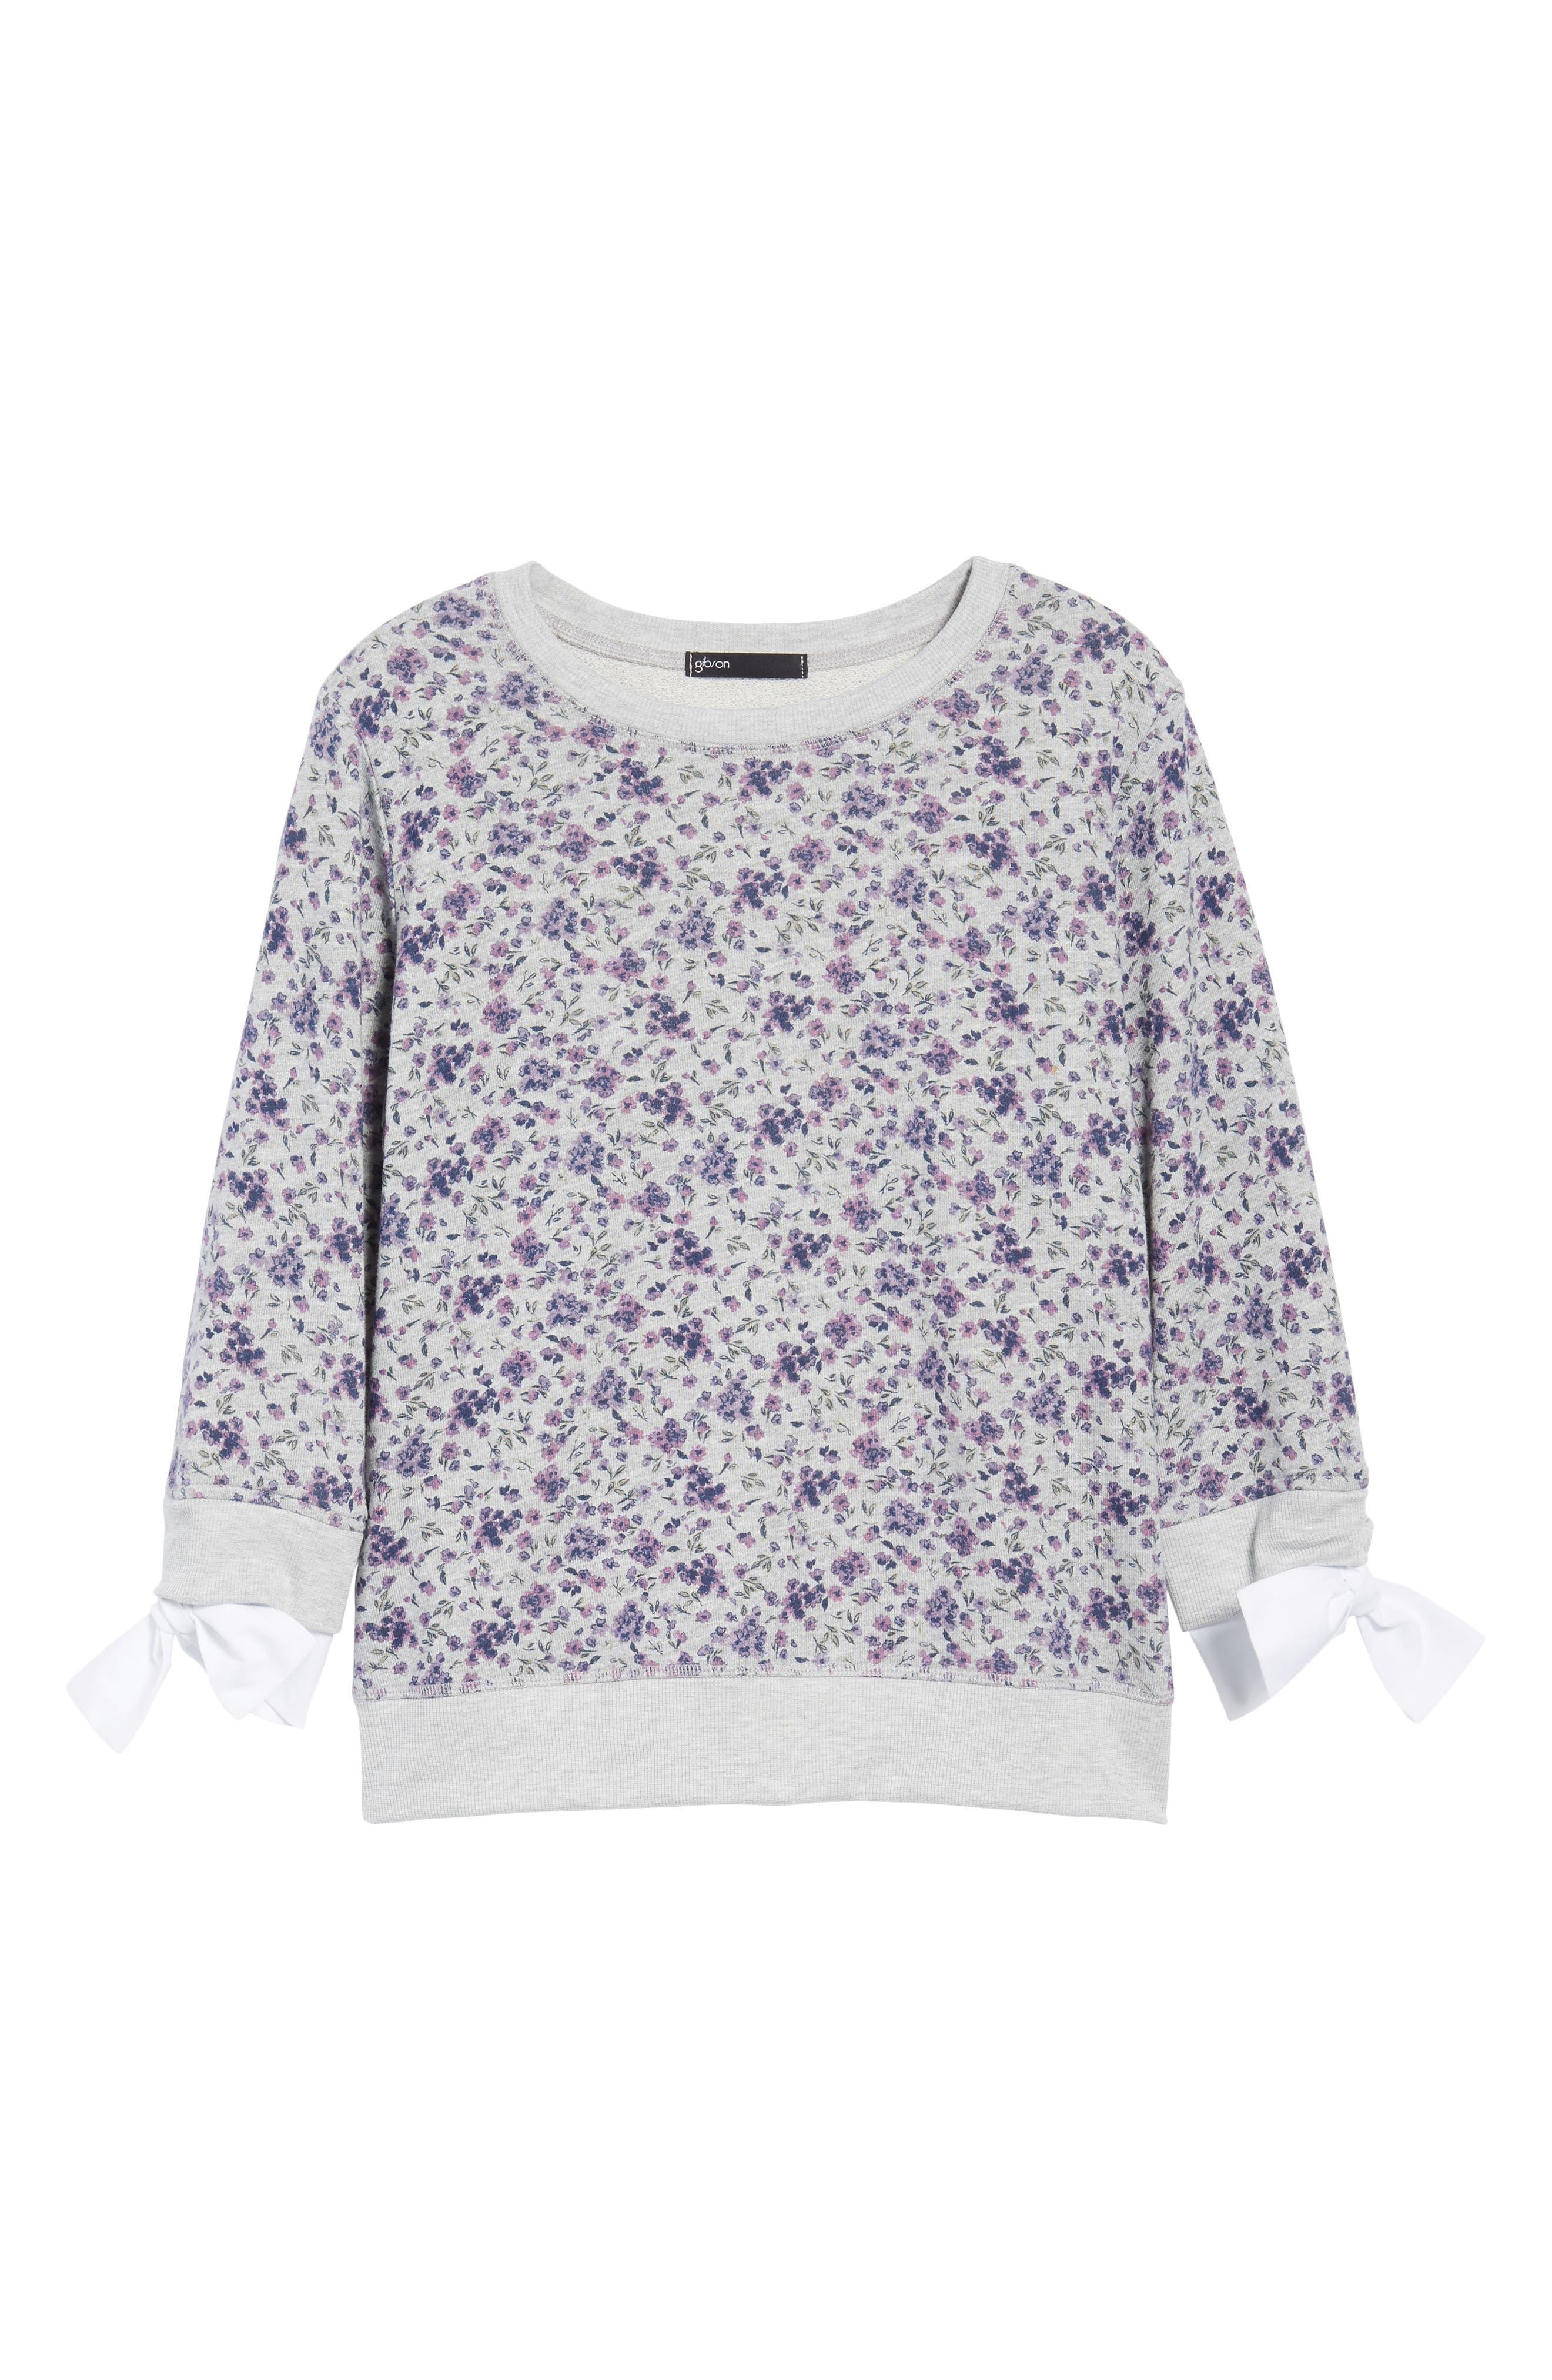 Poplin Cuff Sweatshirt,                             Alternate thumbnail 7, color,                             GREY FLORAL W/ WHITE POPLIN